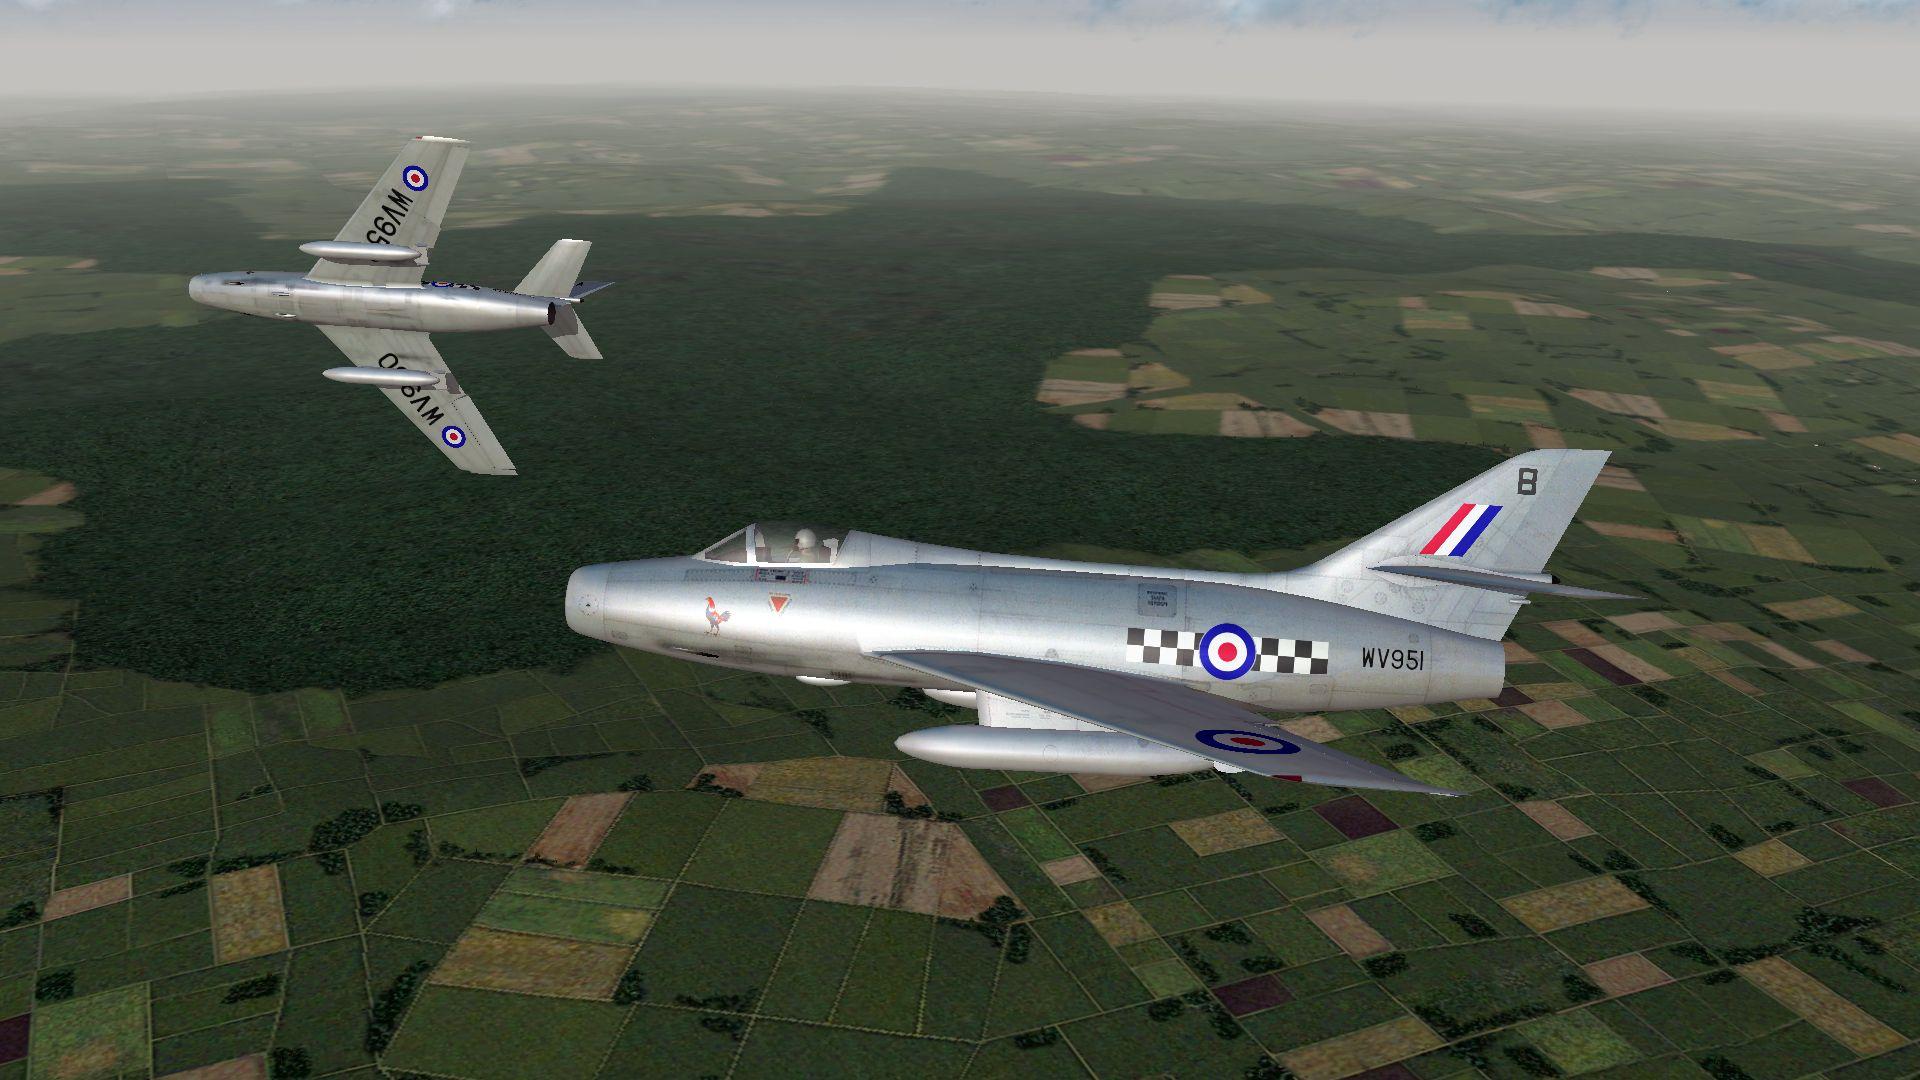 RAF%20SISKIN%20F1.04_zpsn5pmh8hr.jpg